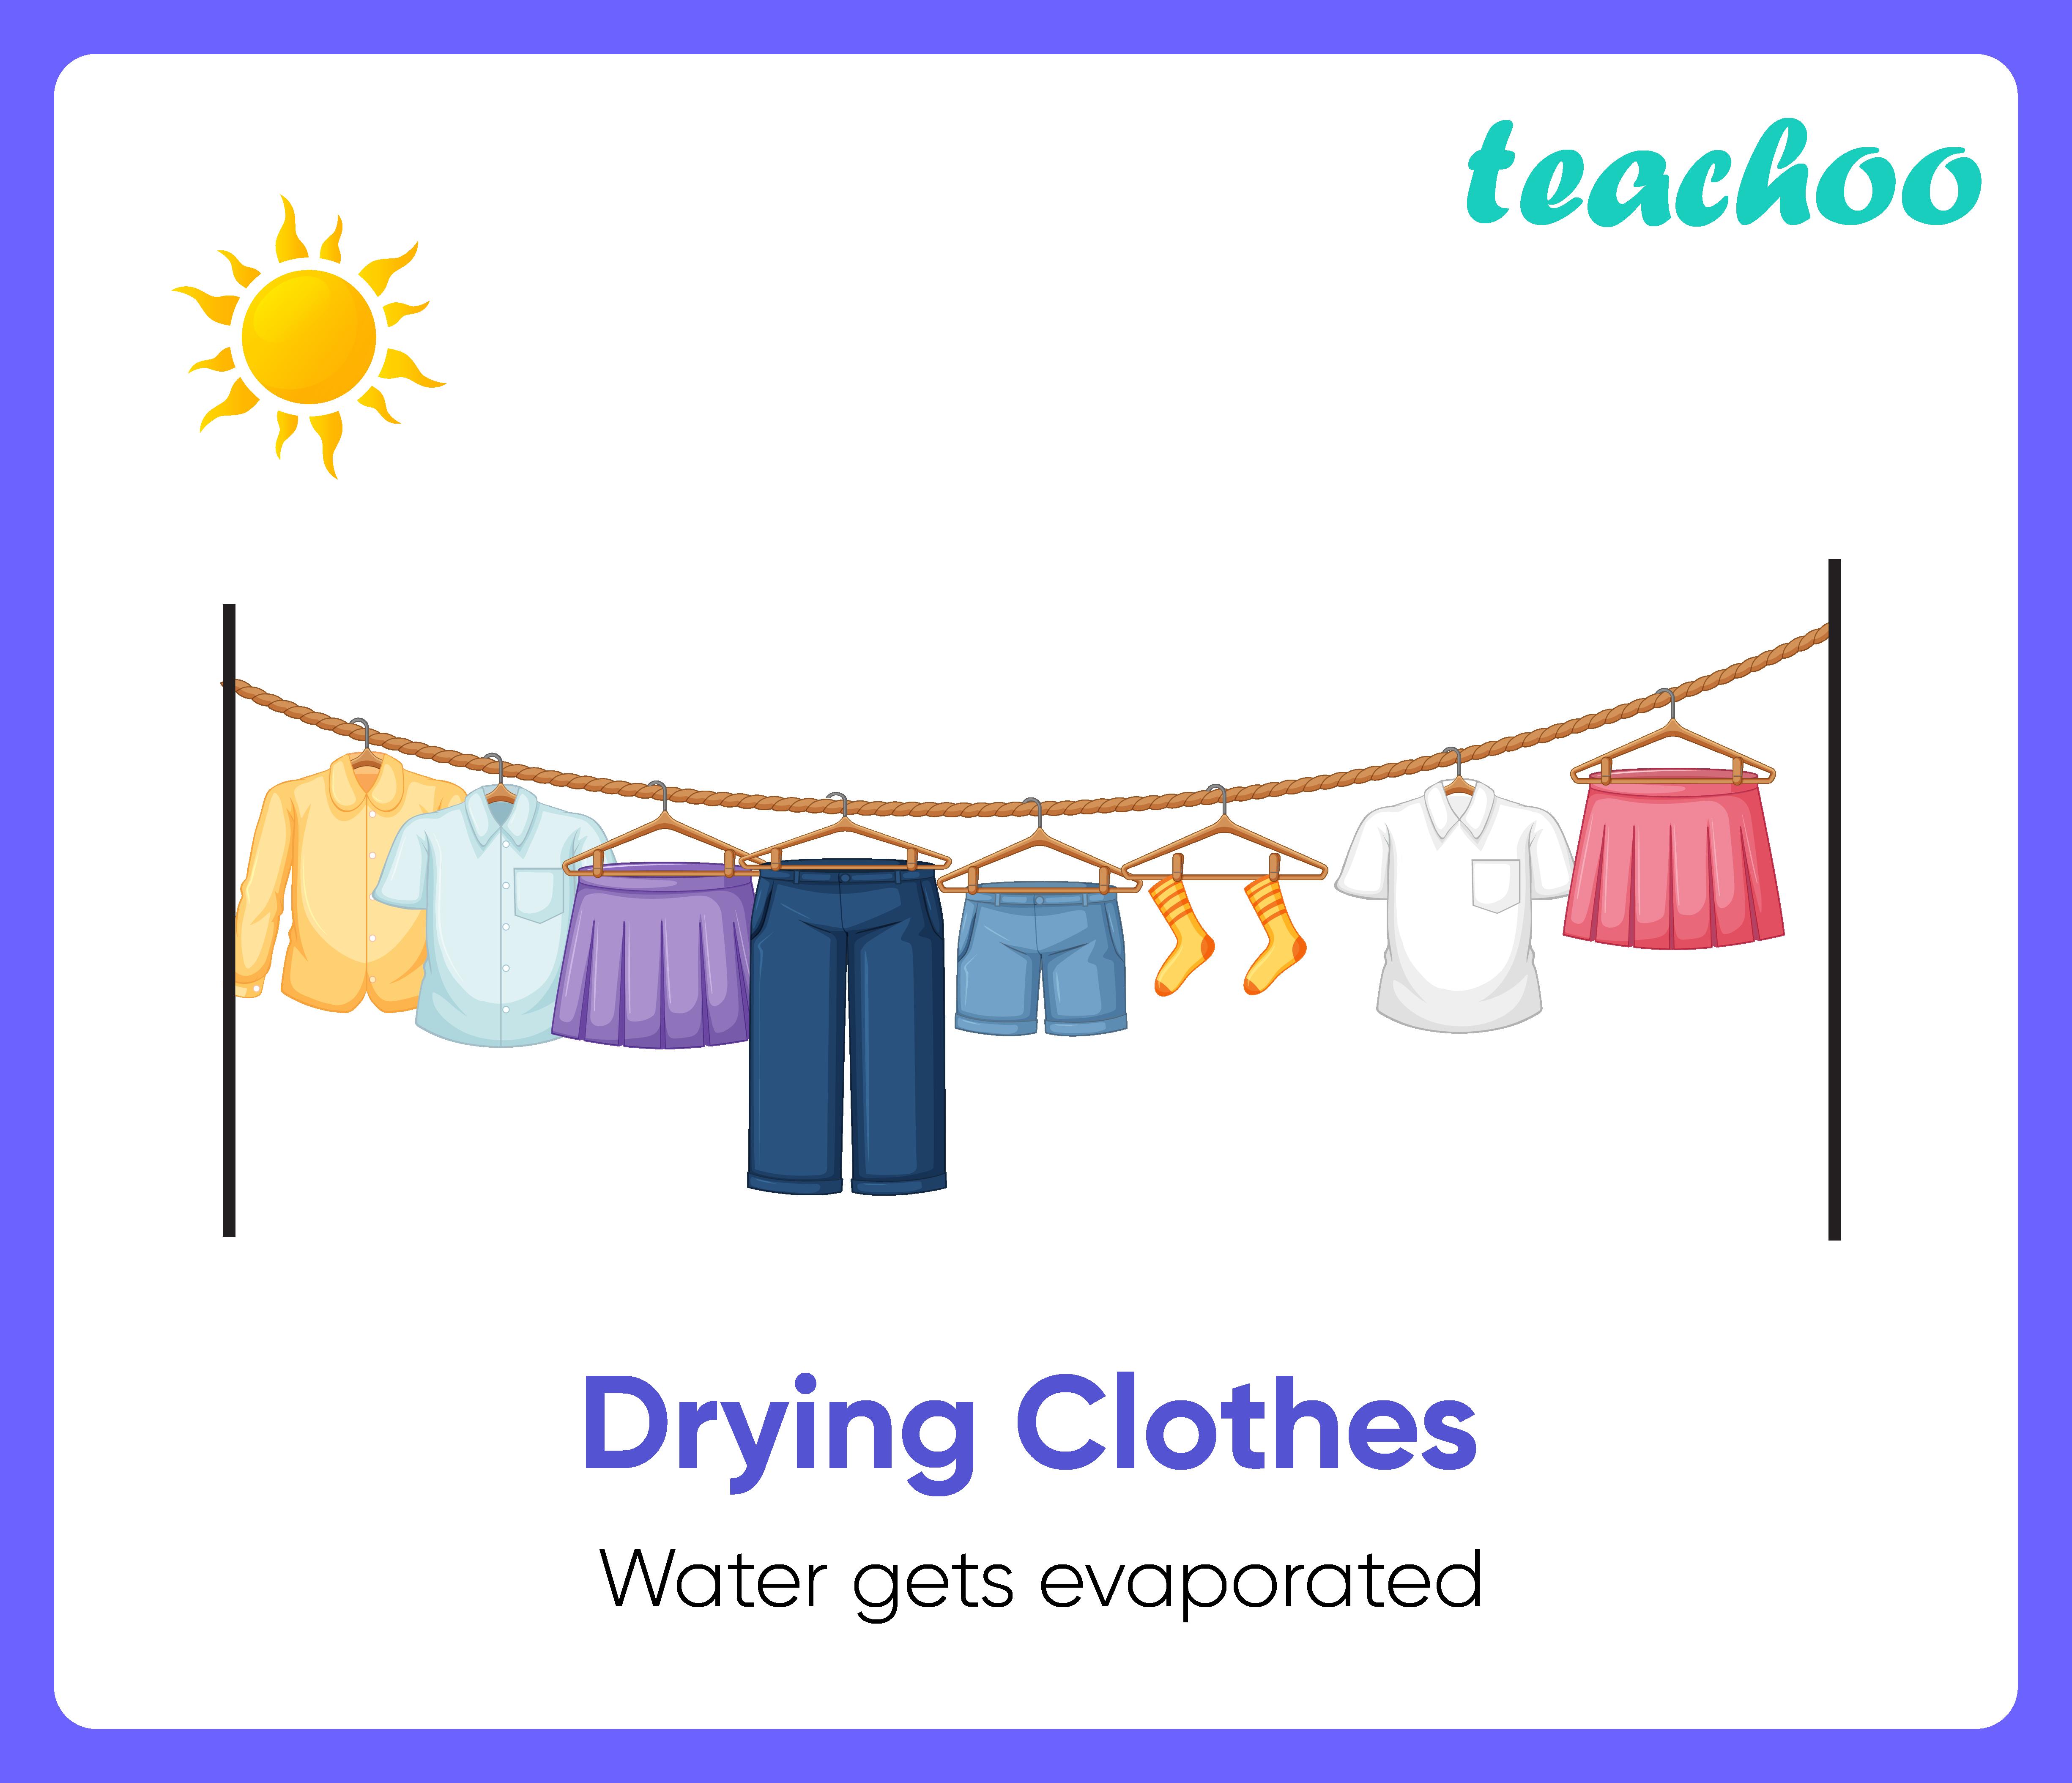 Drying Clothes-Teachoo-01.png